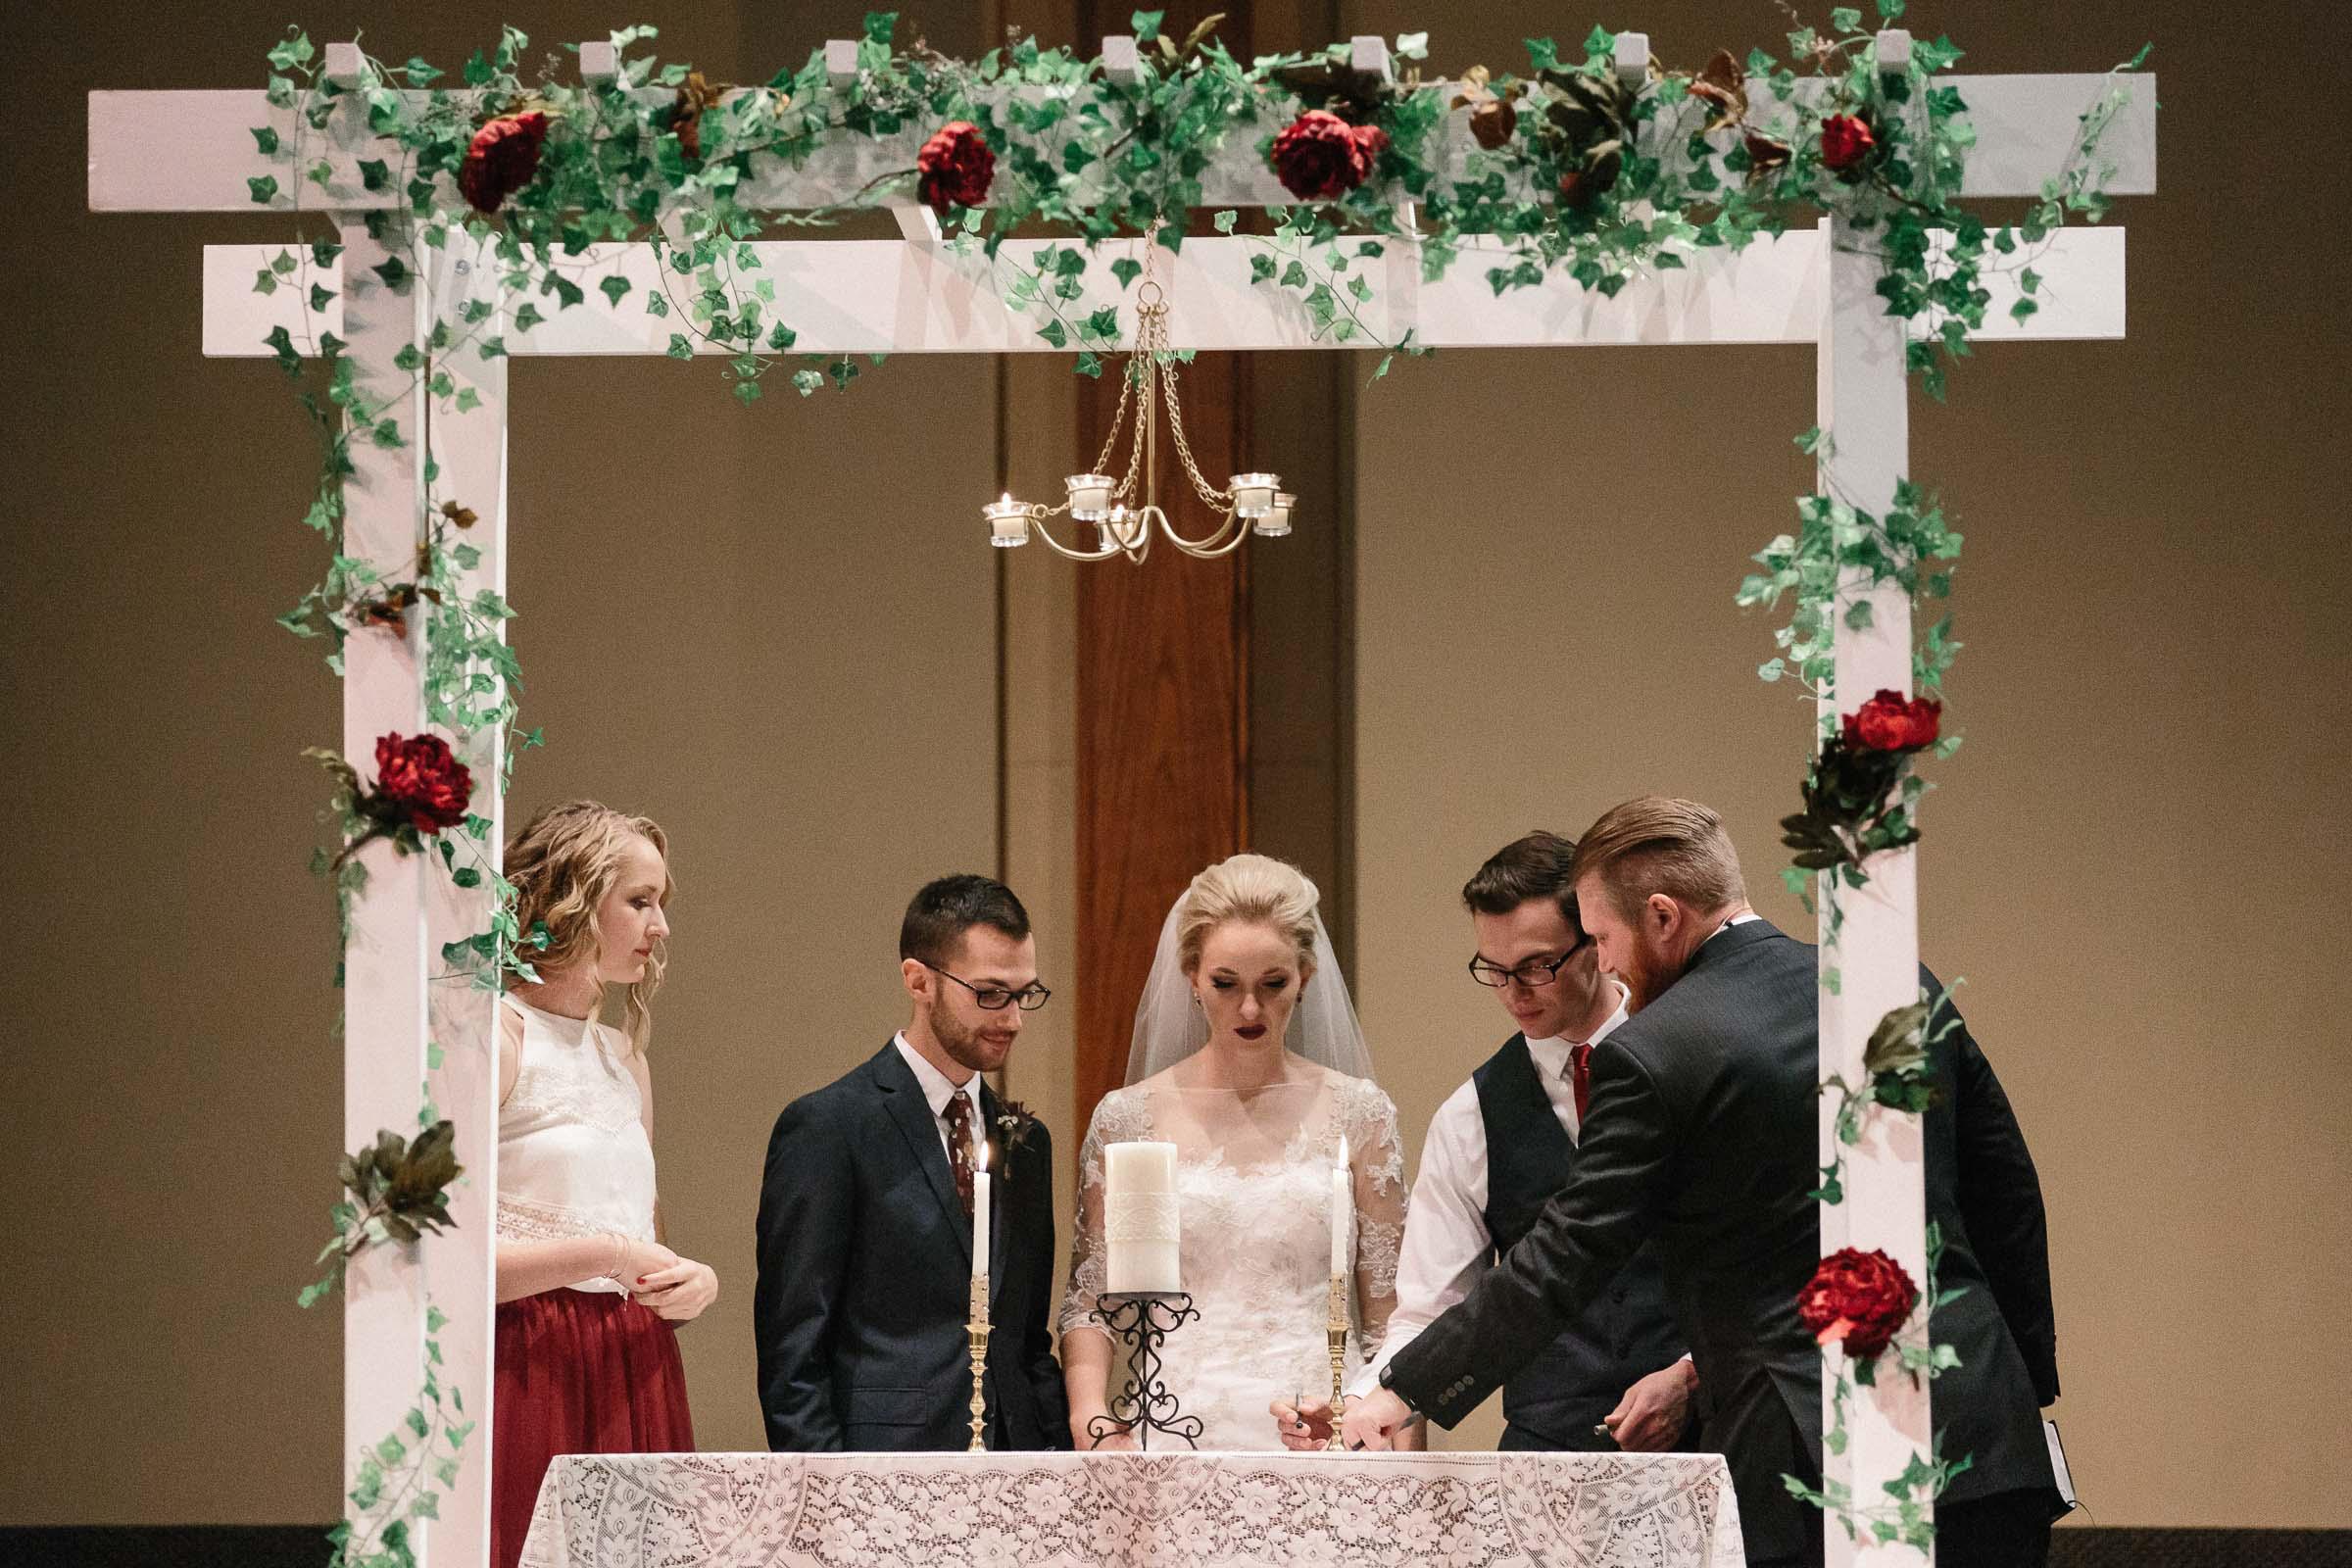 Jenna&Austin_SiouxFalls_Wedding_Photographer_077.jpg